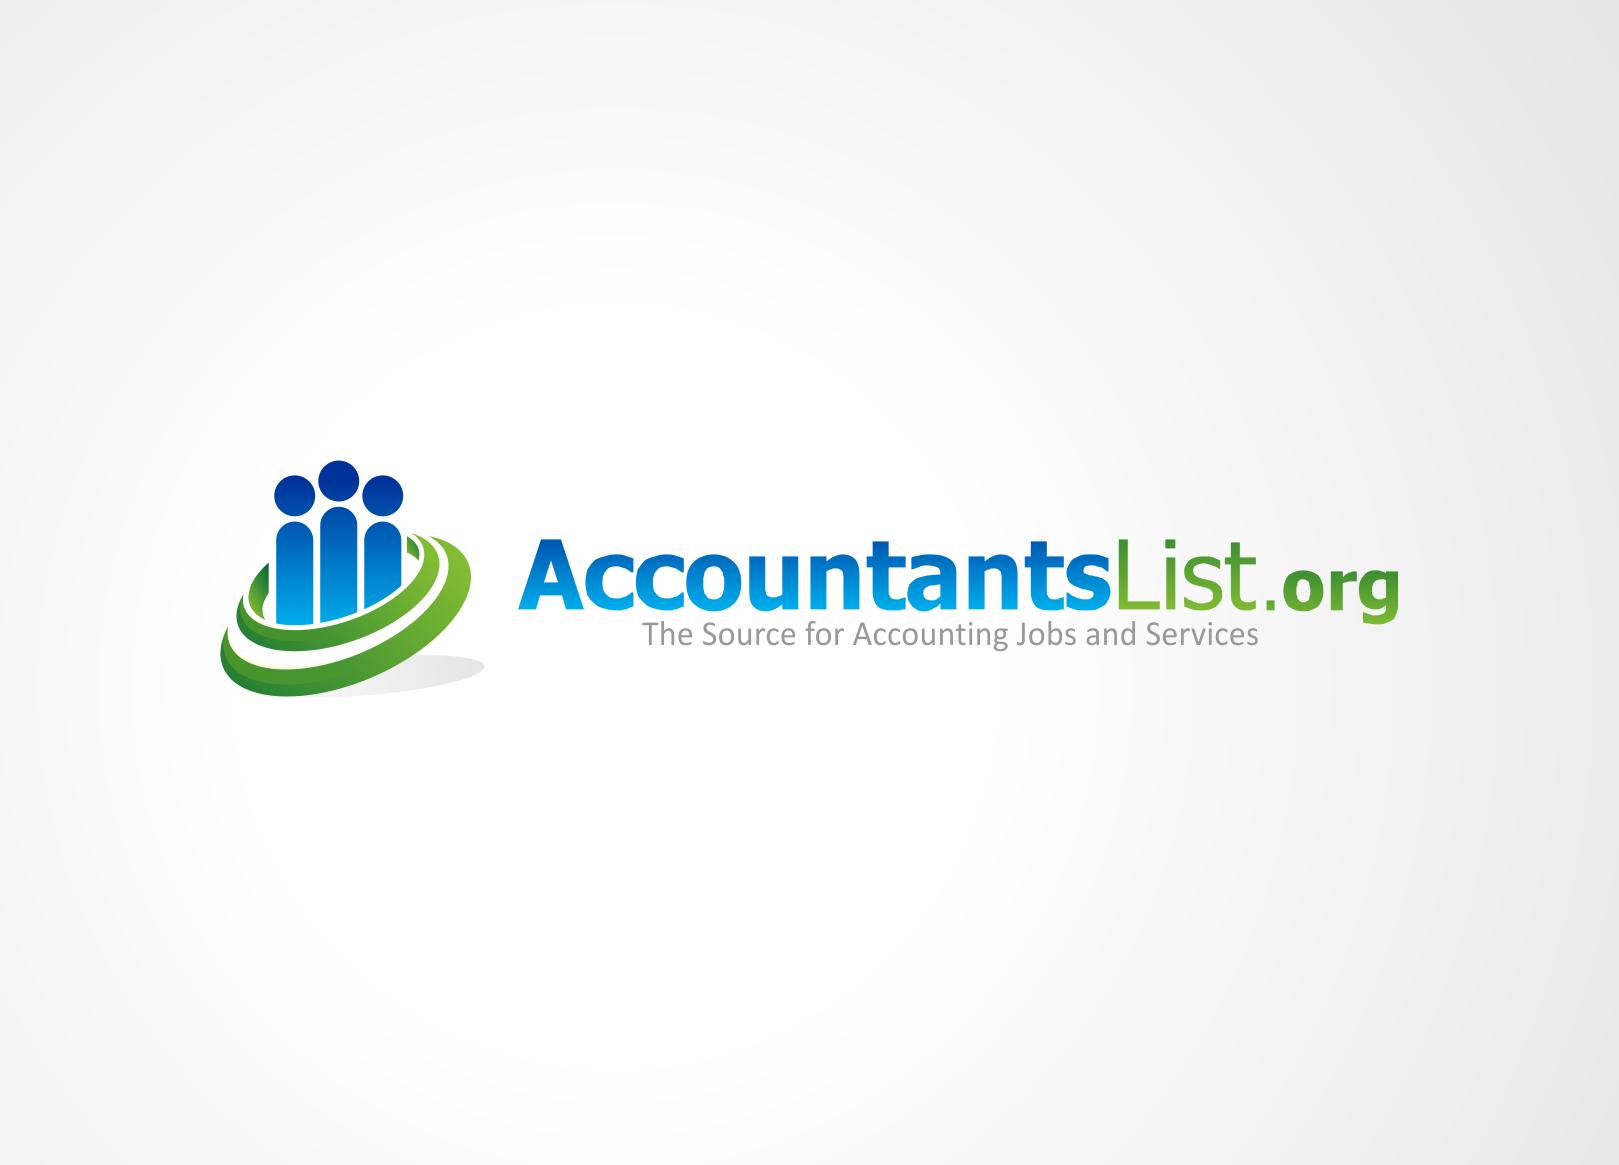 Create the next logo for AccountantsList.org